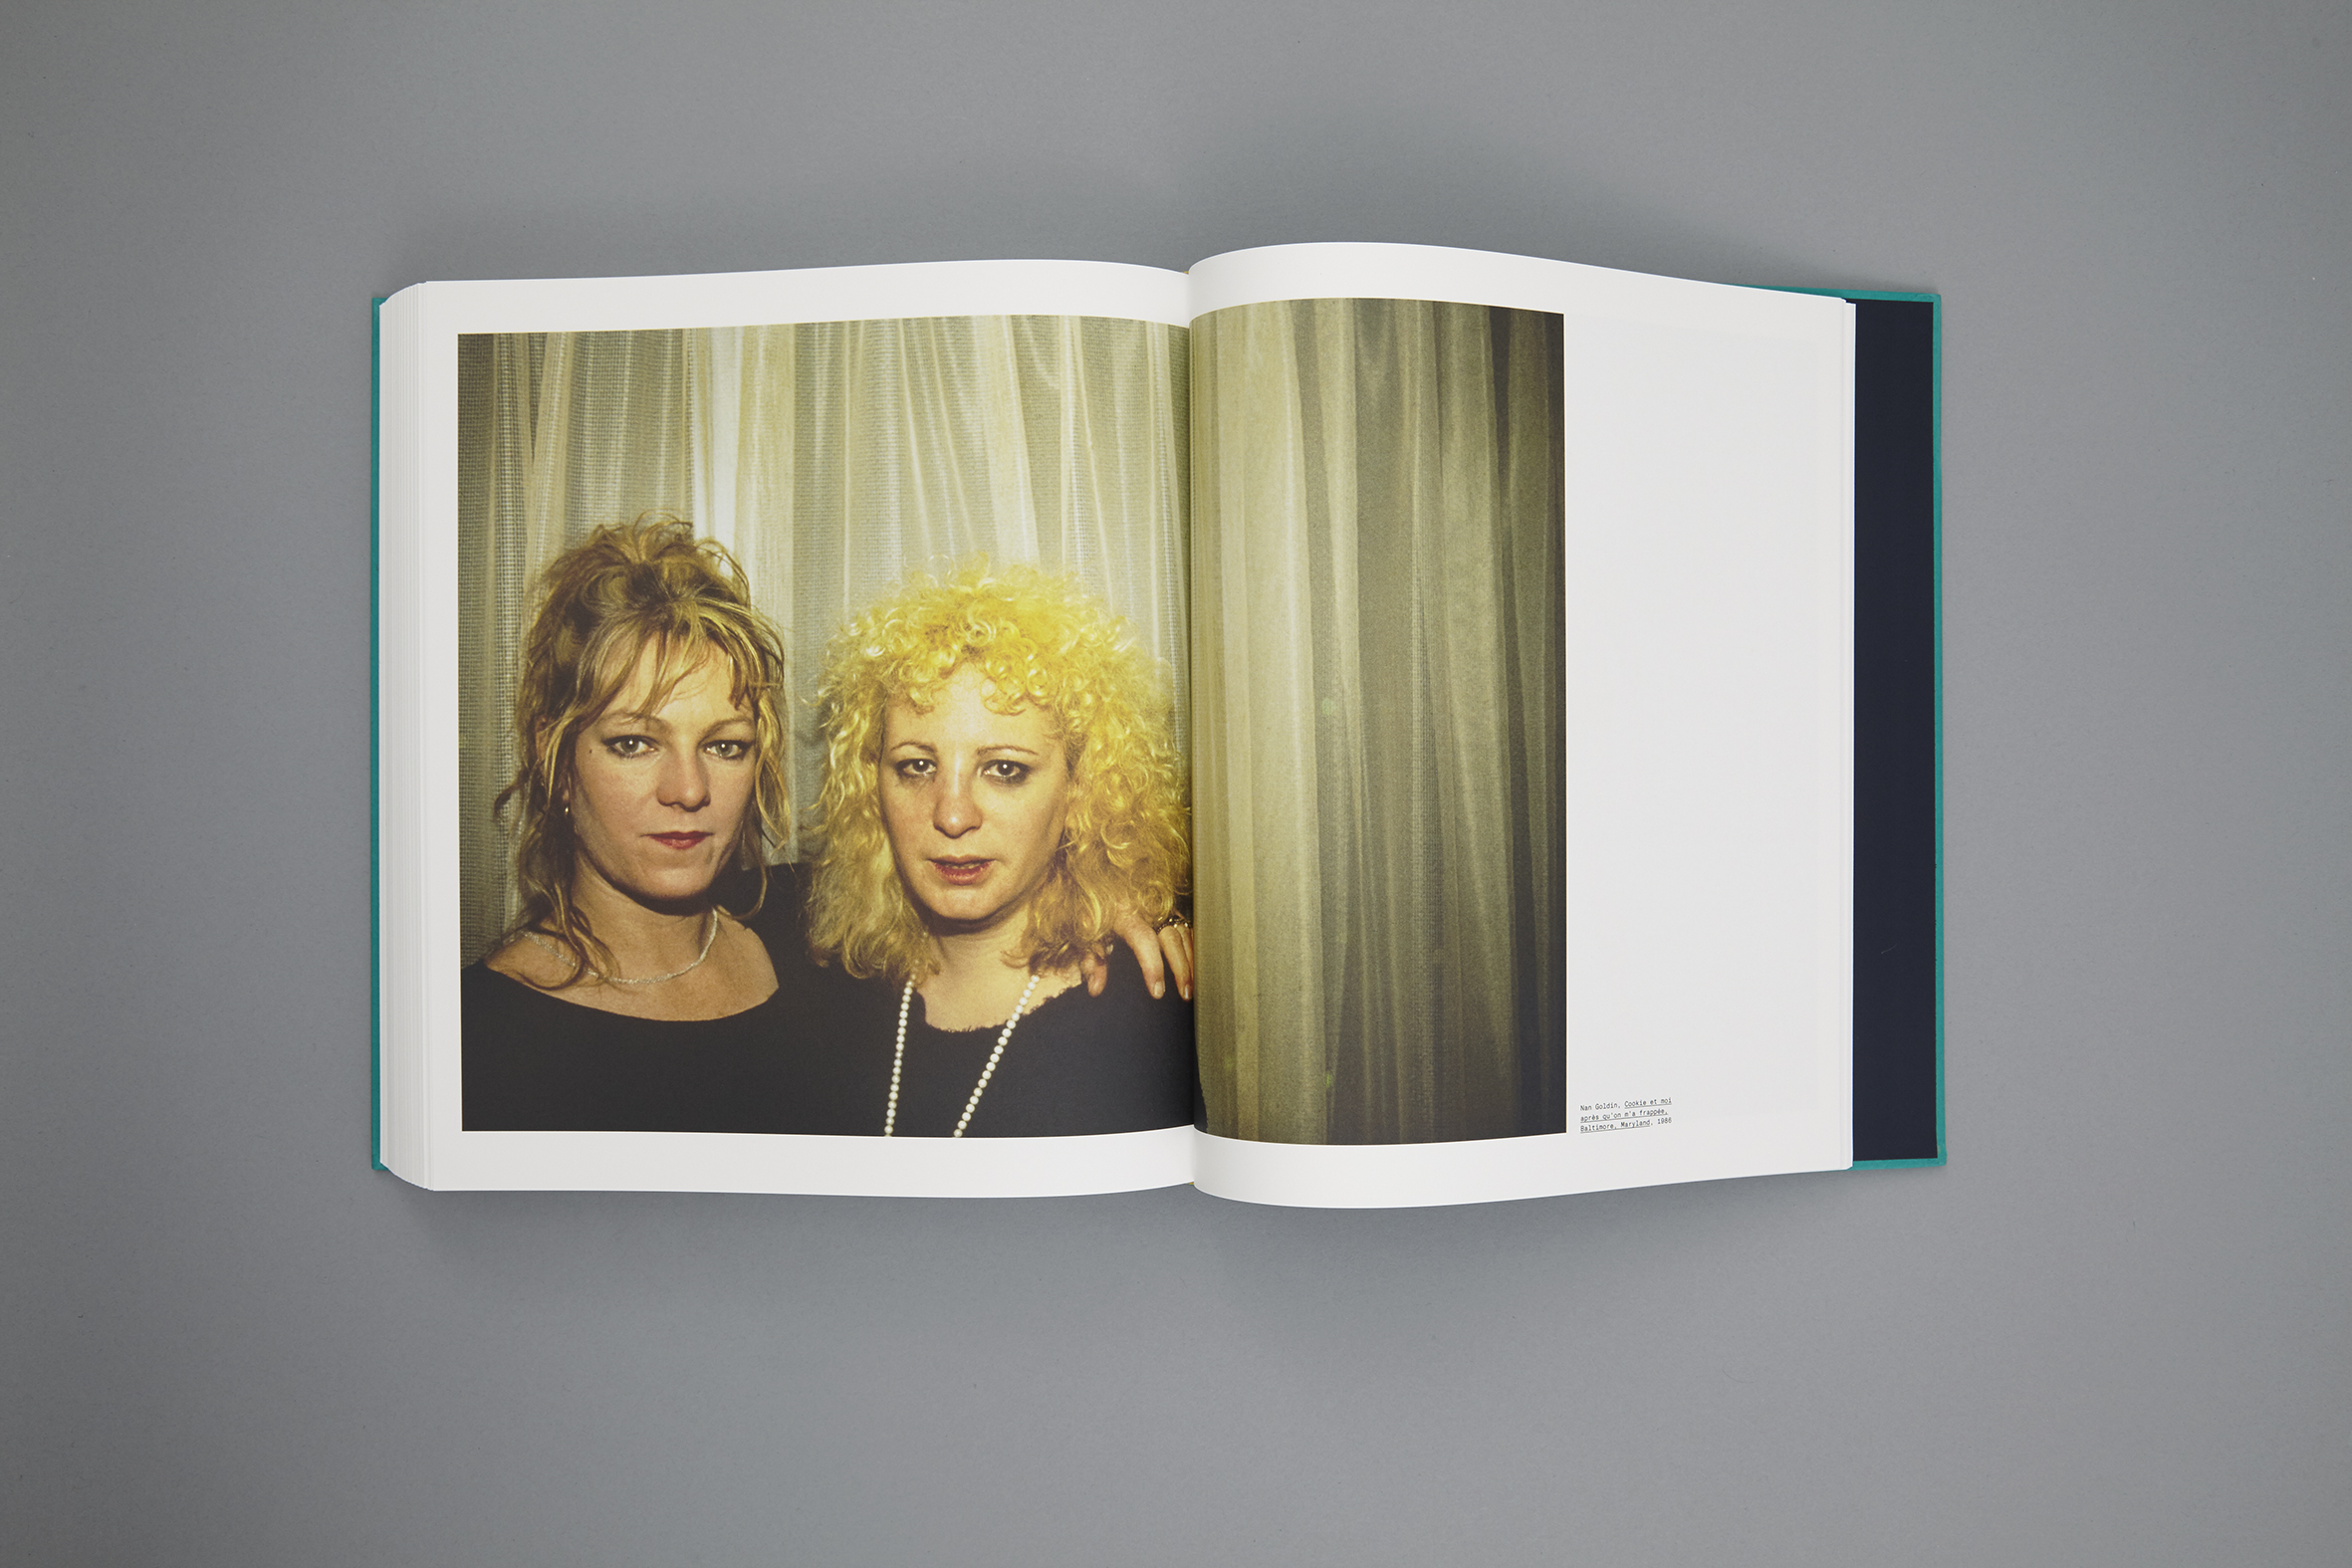 lebart-robert-dahan-histoire-mondiale-femmes-photographes-delpire-co-8